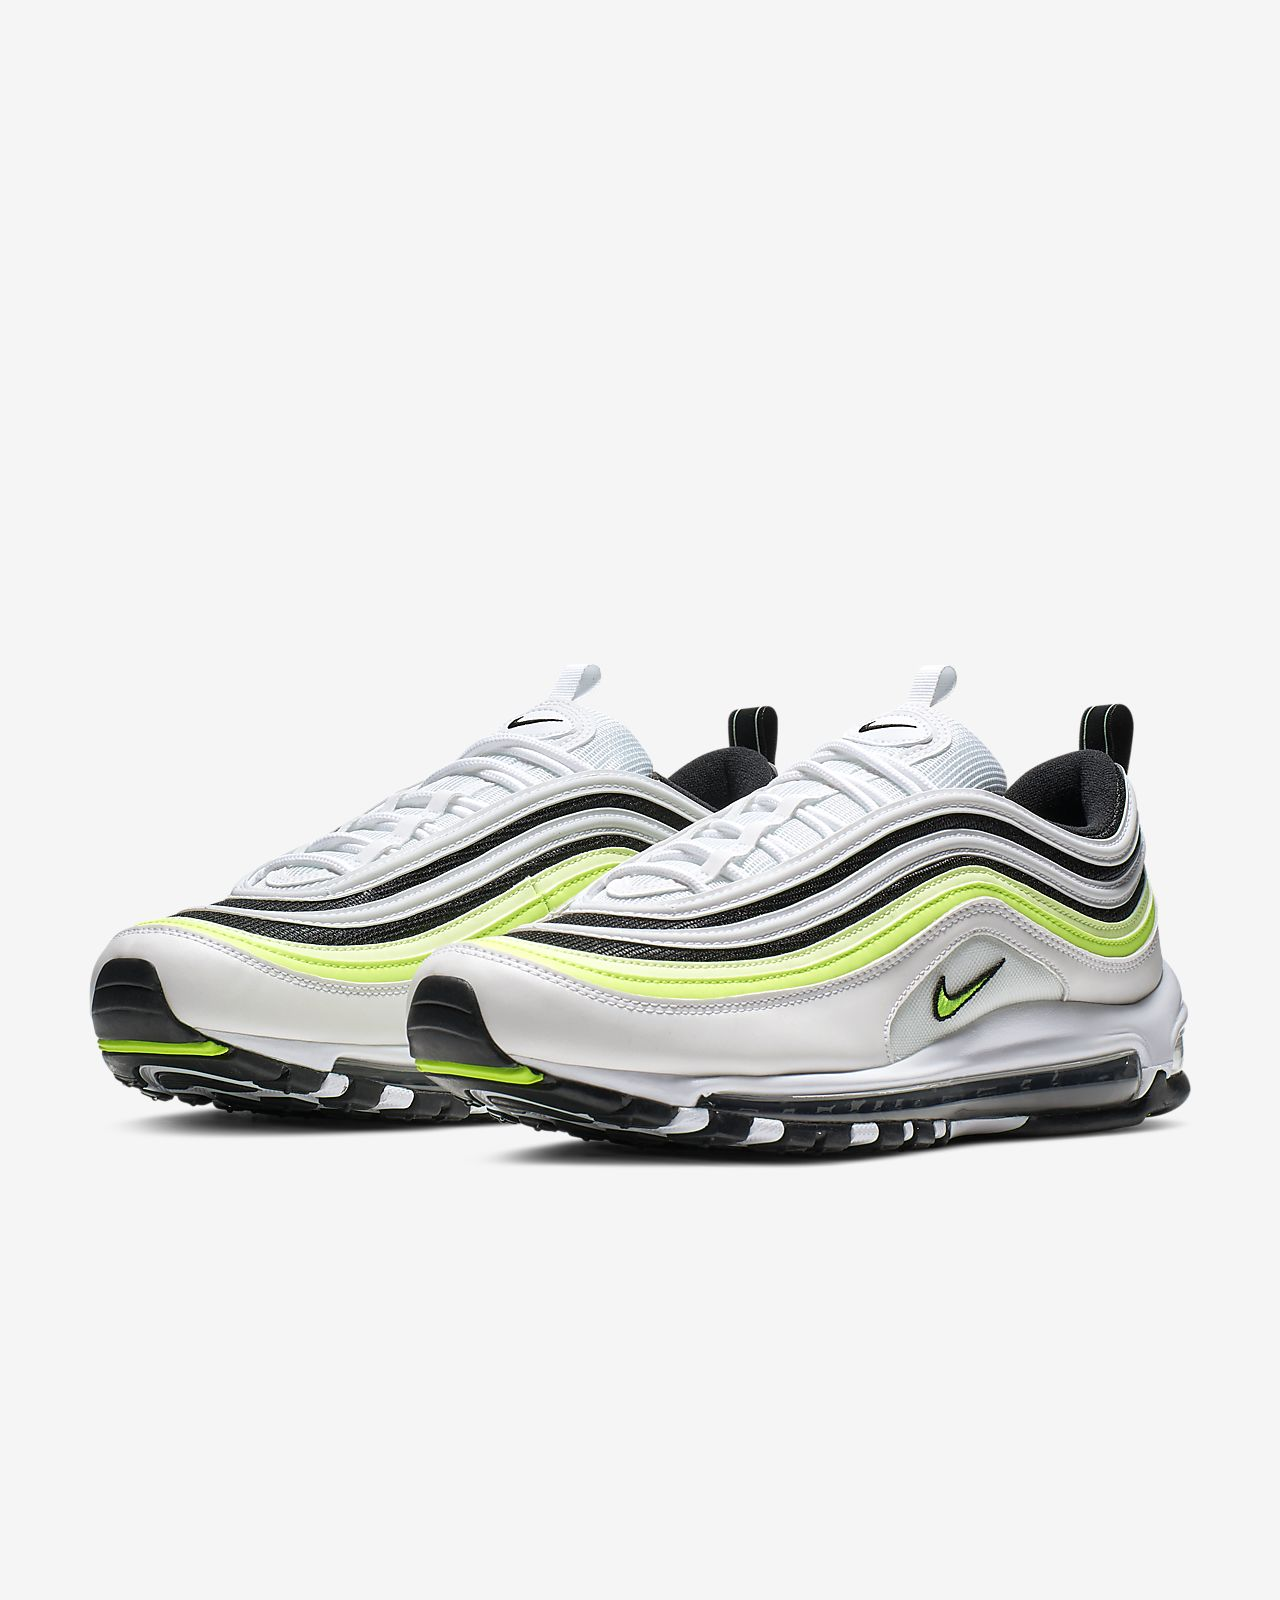 Nike Air Max 97 SE Barely Volt